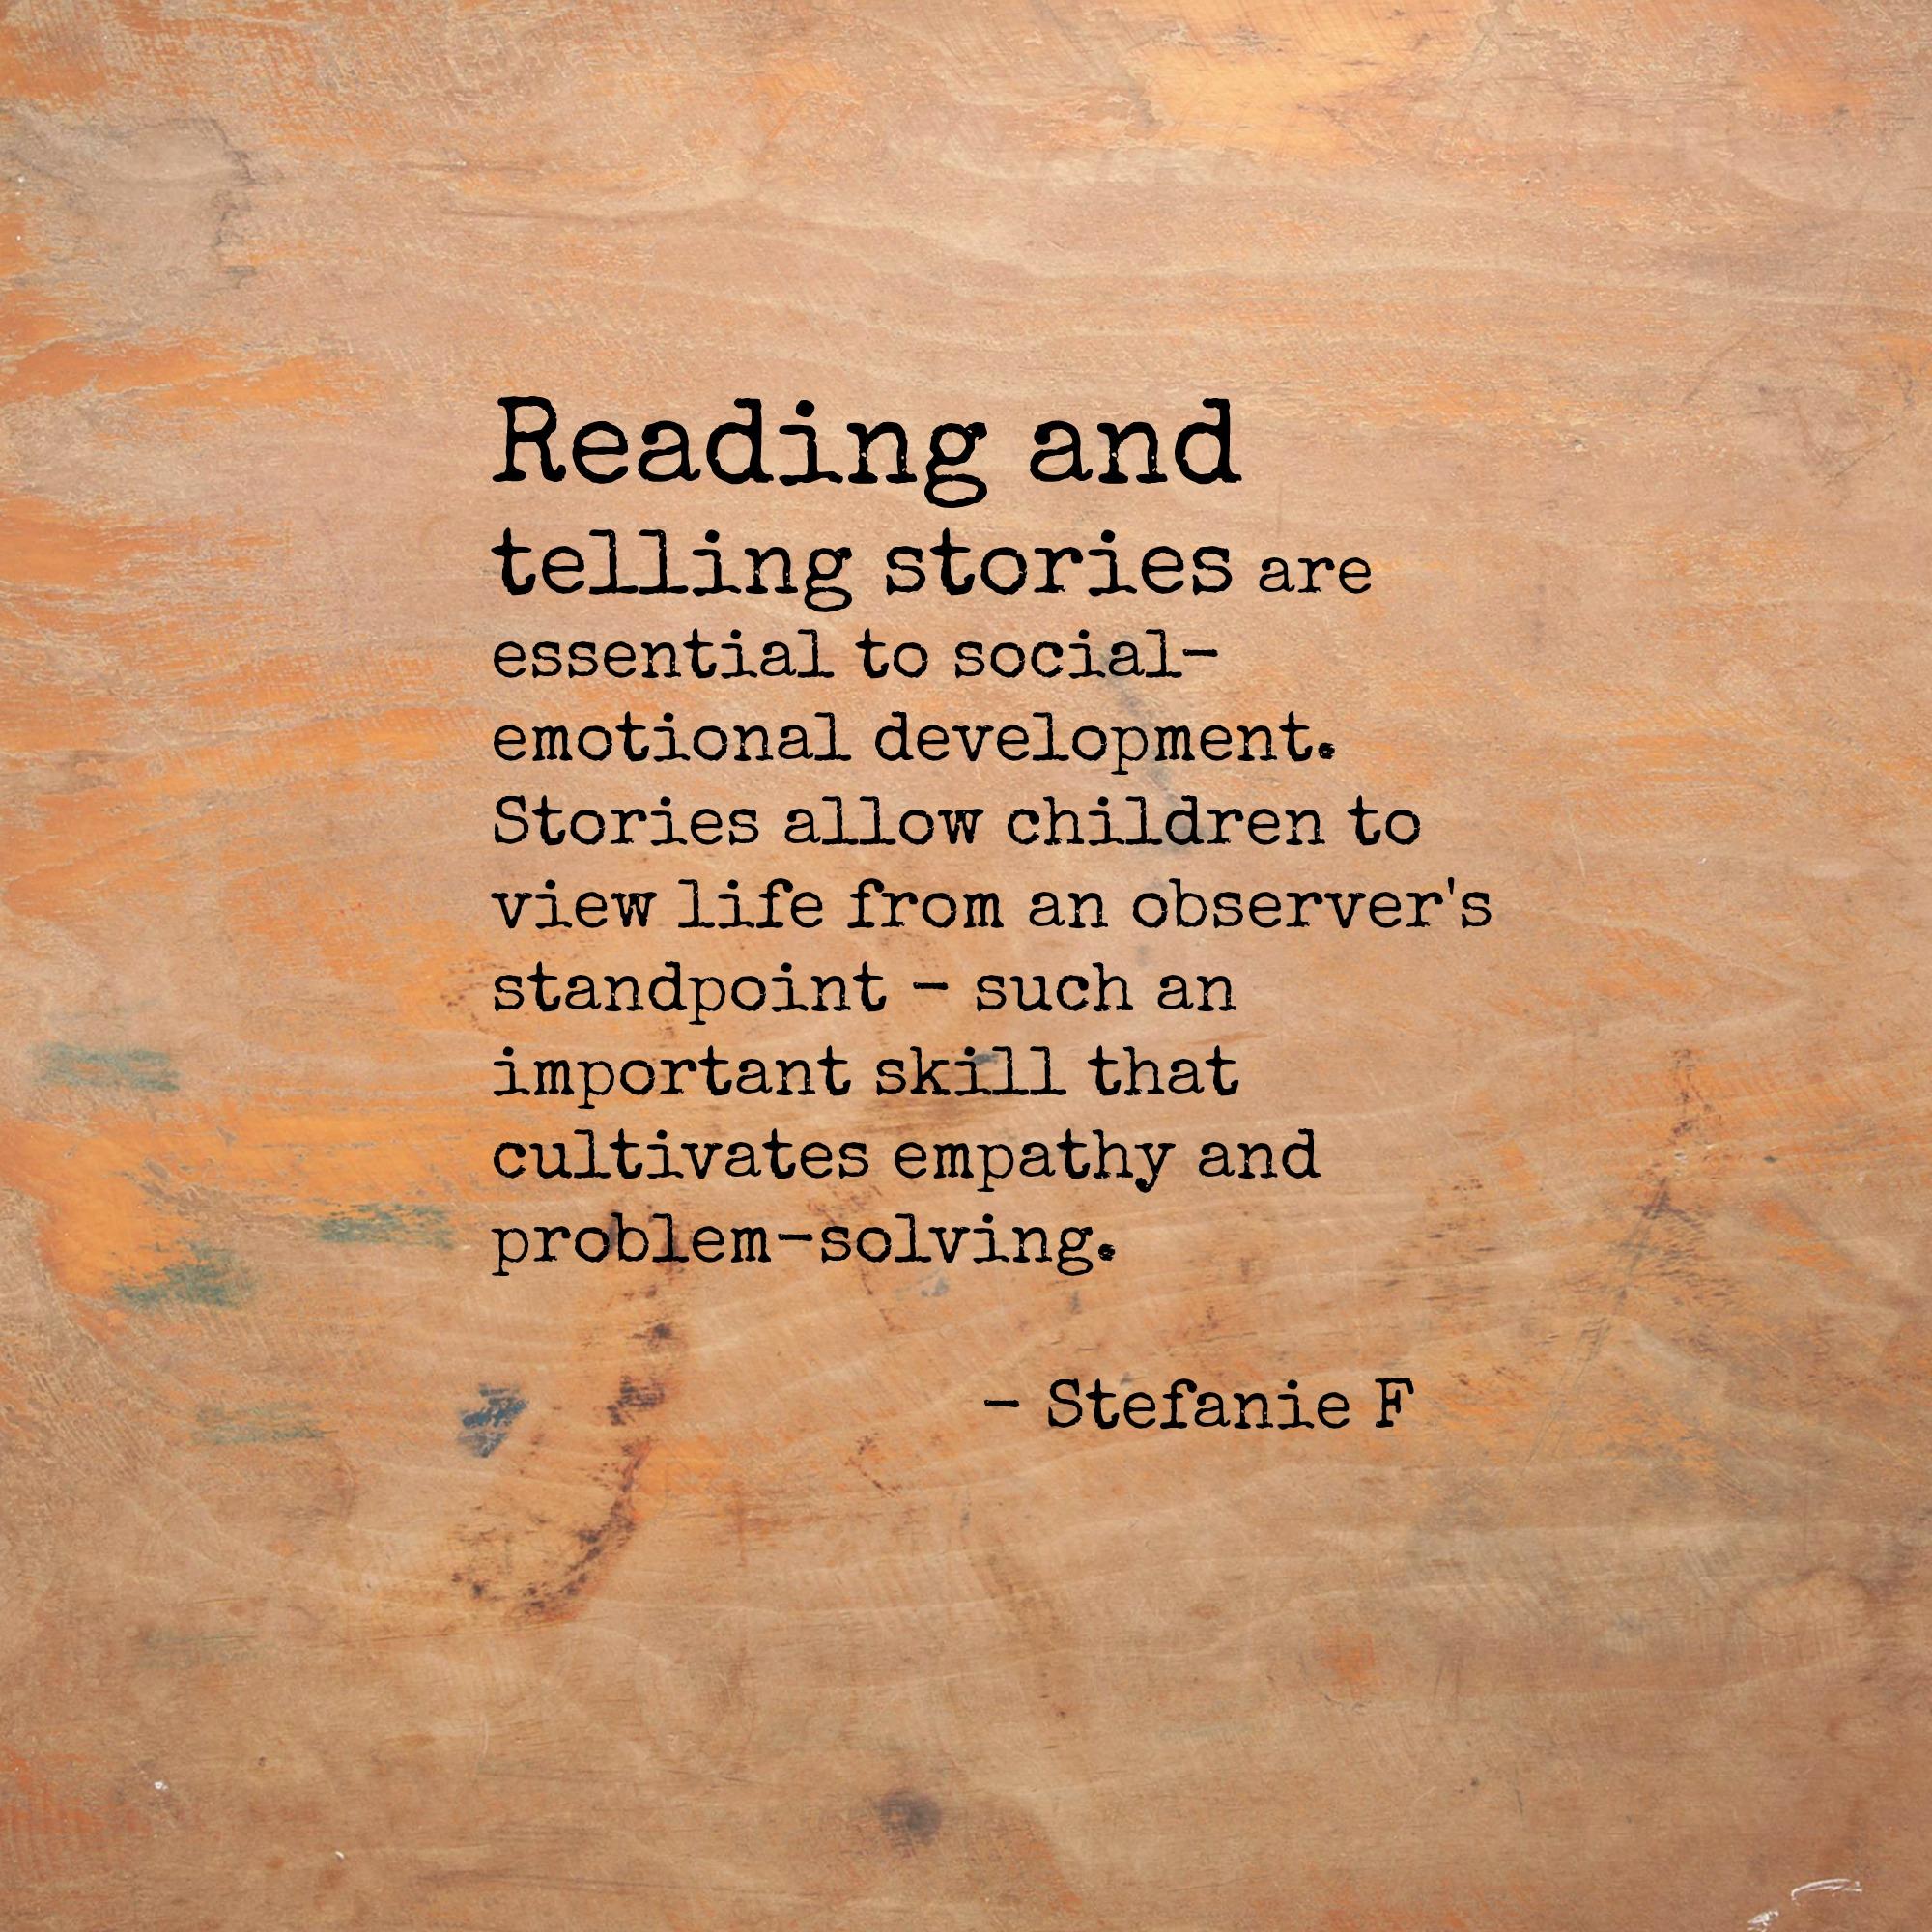 Stefanie F On Reading